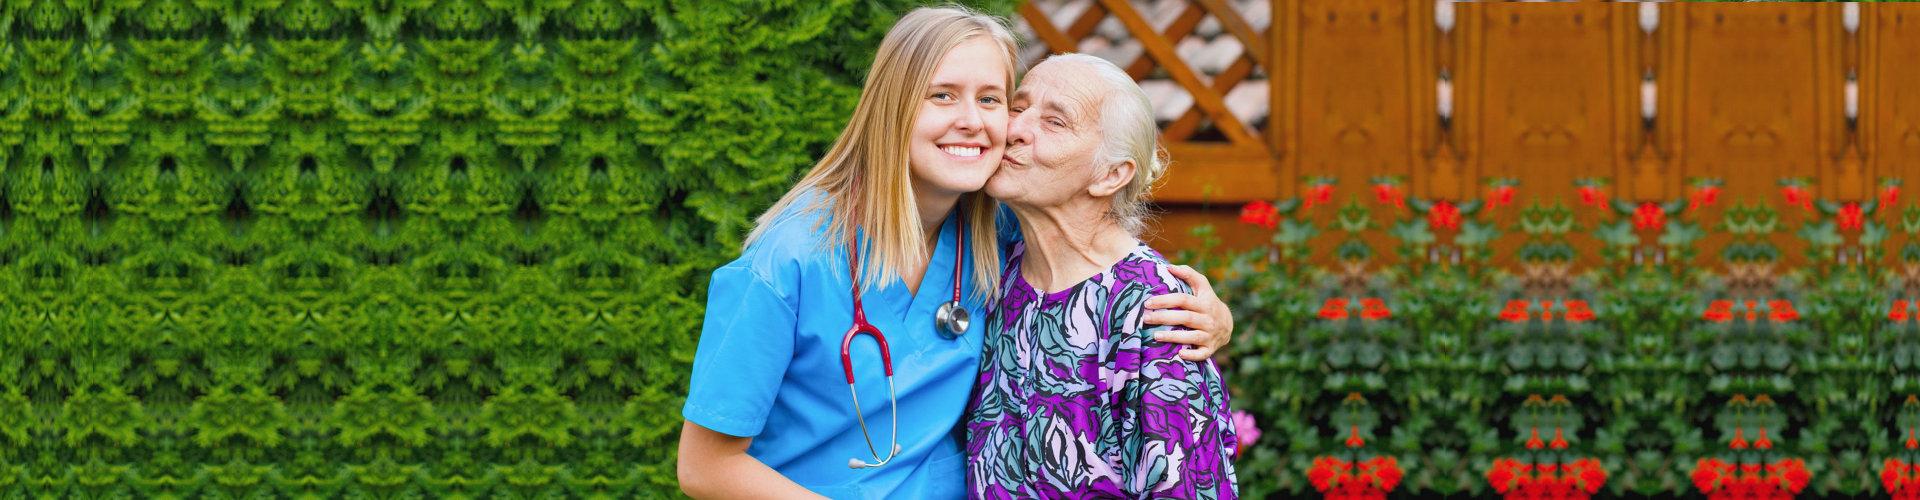 senior woman kisses a medical personnel